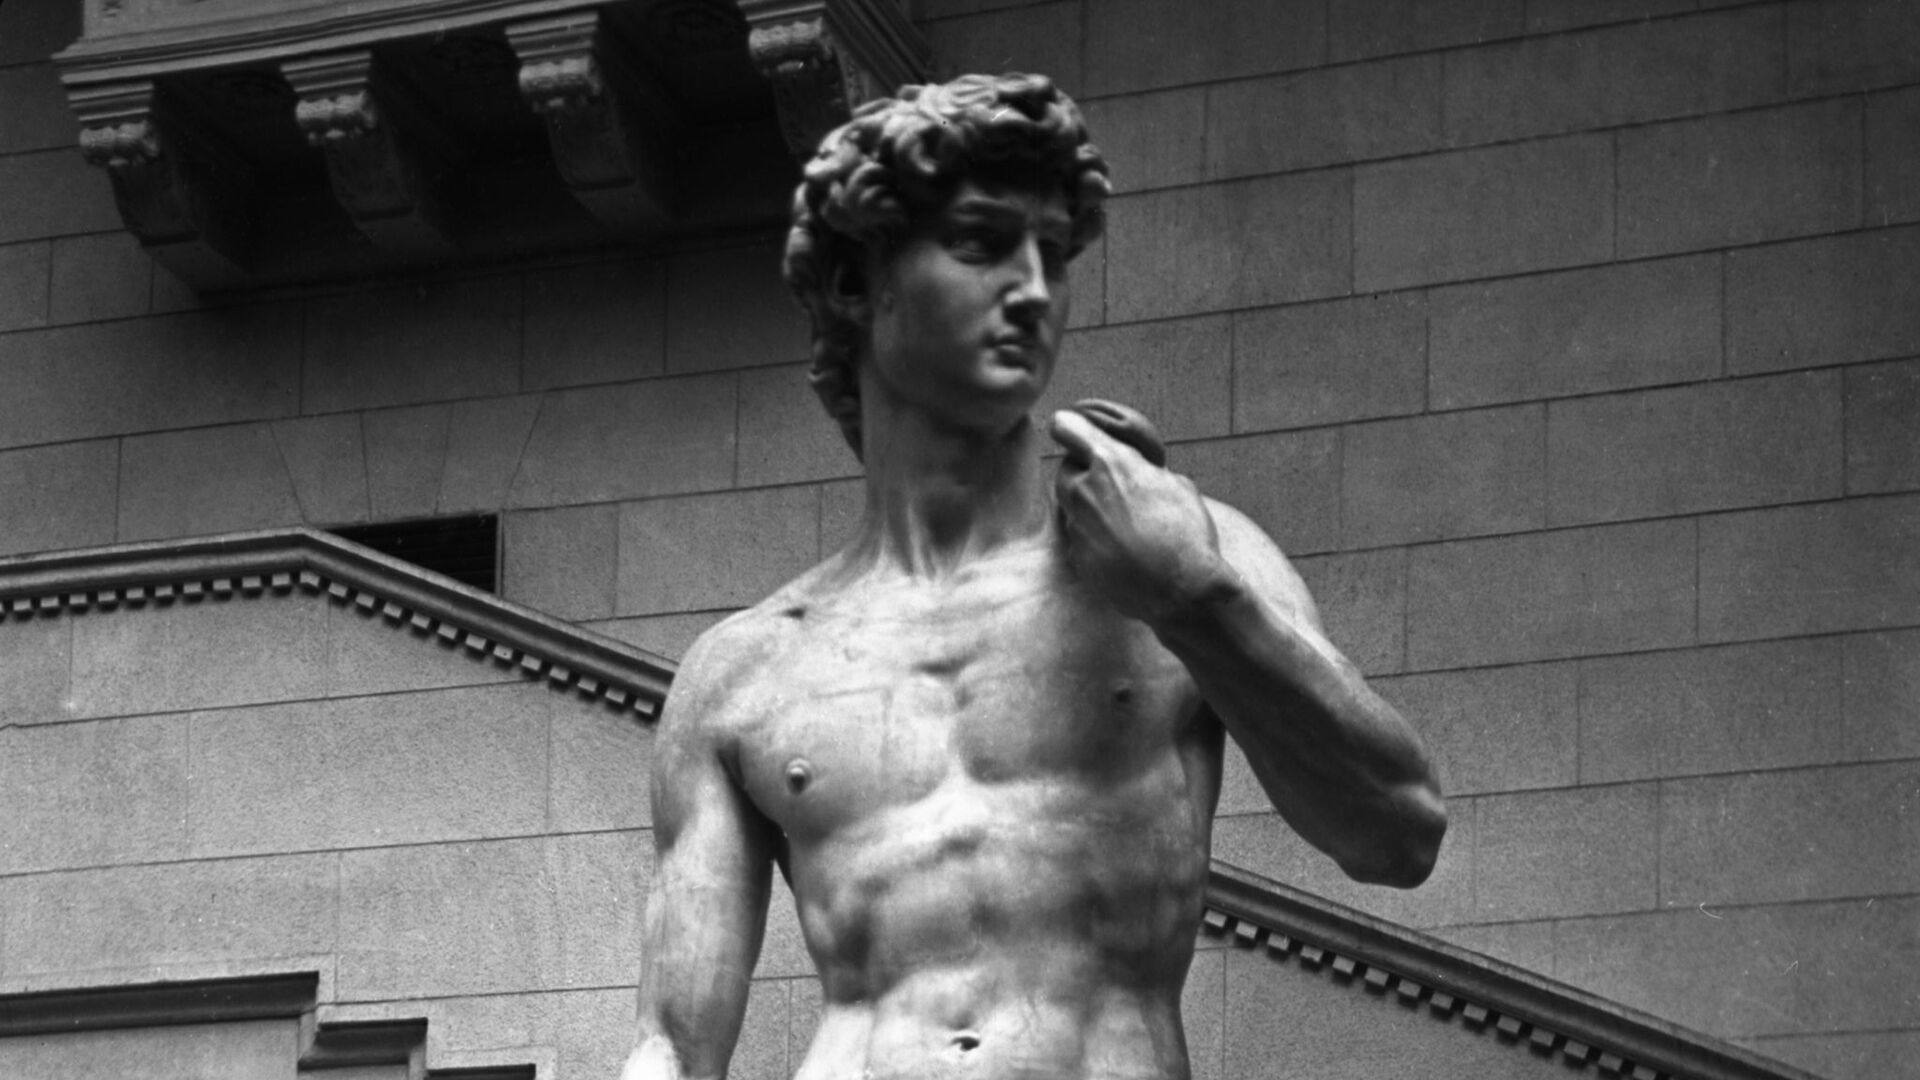 скульптура Давида работы Микеланджело Буонарроти - Sputnik Грузия, 1920, 06.09.2021